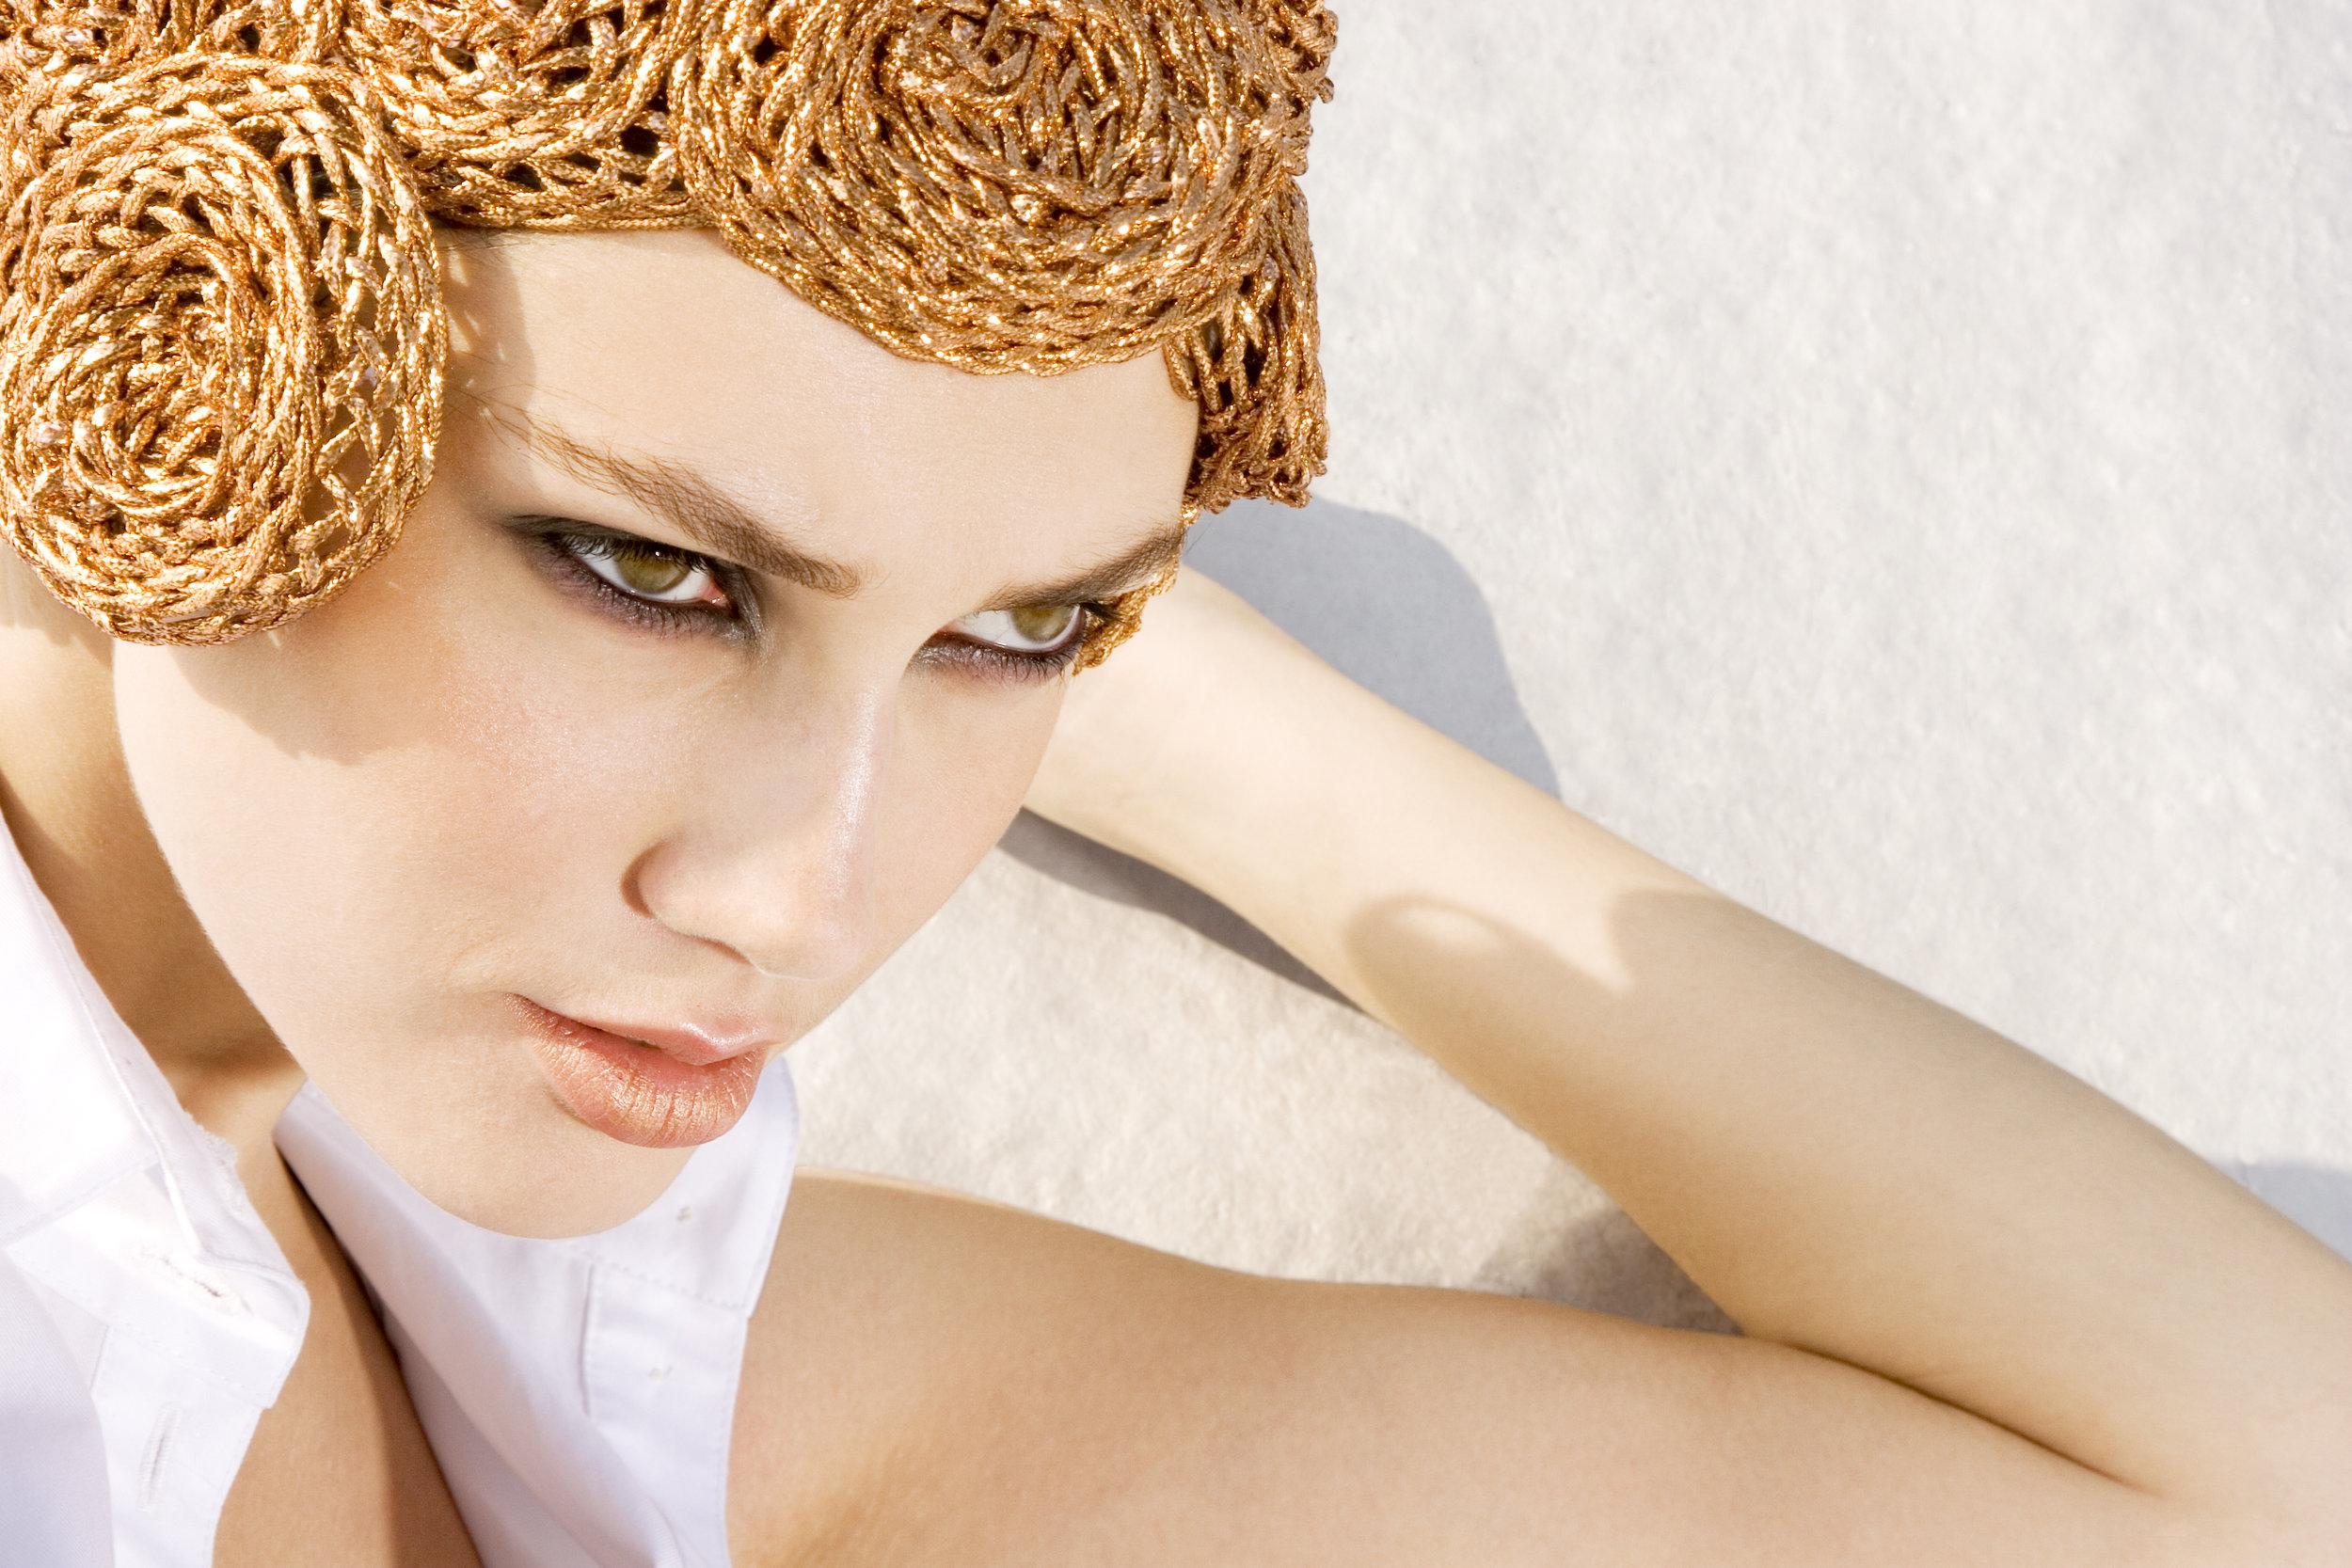 Photos: Idris & Tony & Model: Ruslana Korshunova